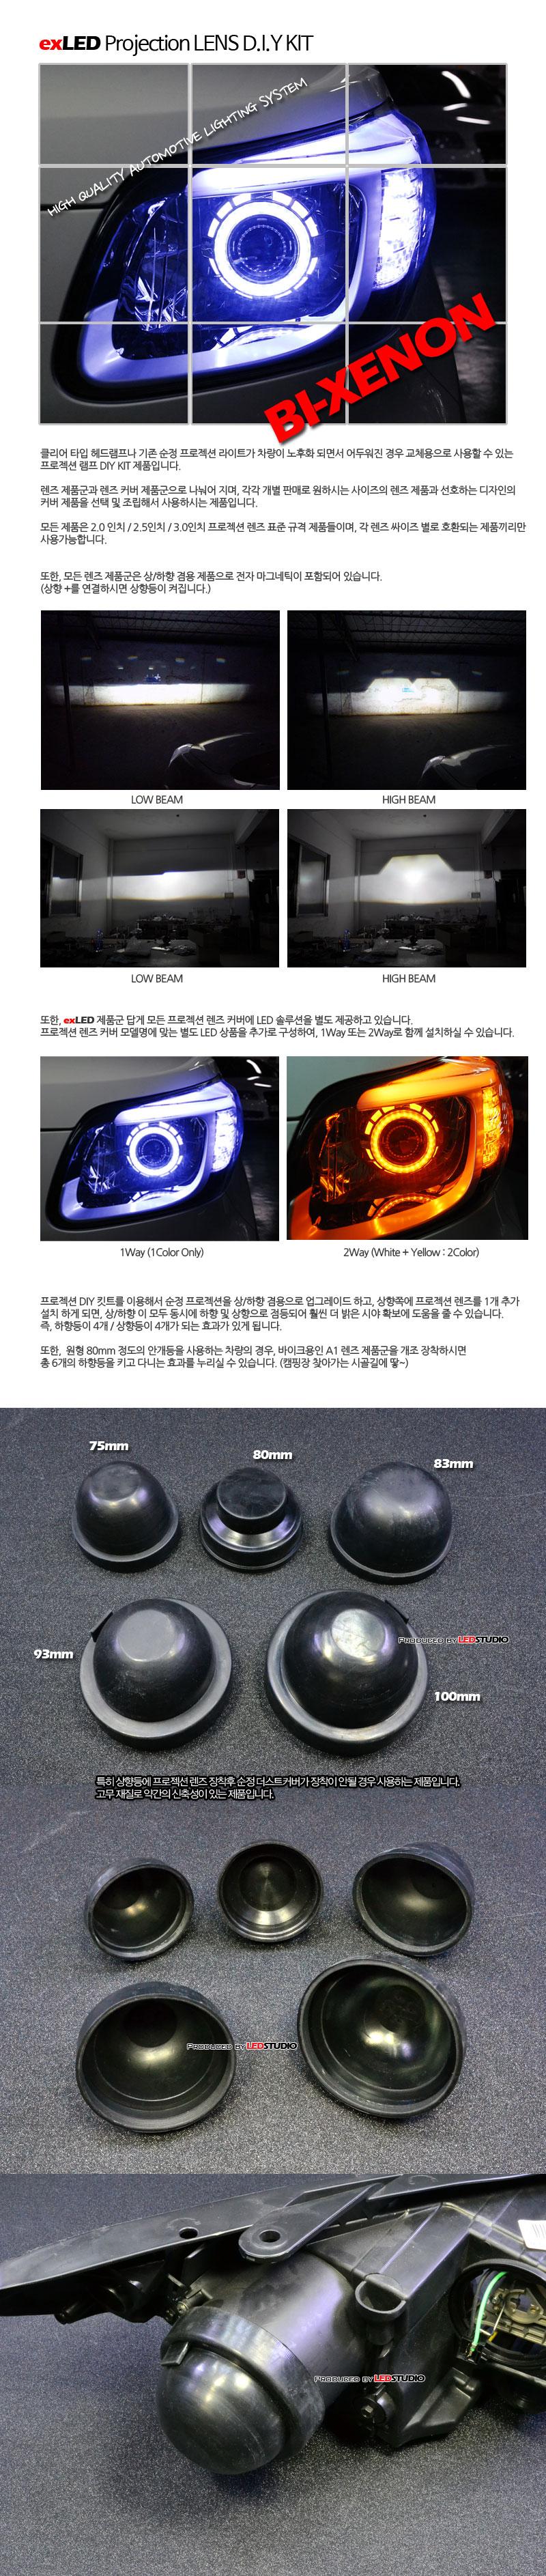 exLED 프로젝션 렌즈 DIY KIT - 고무 더스트 커버 (렌즈 개조용) (1PCS)